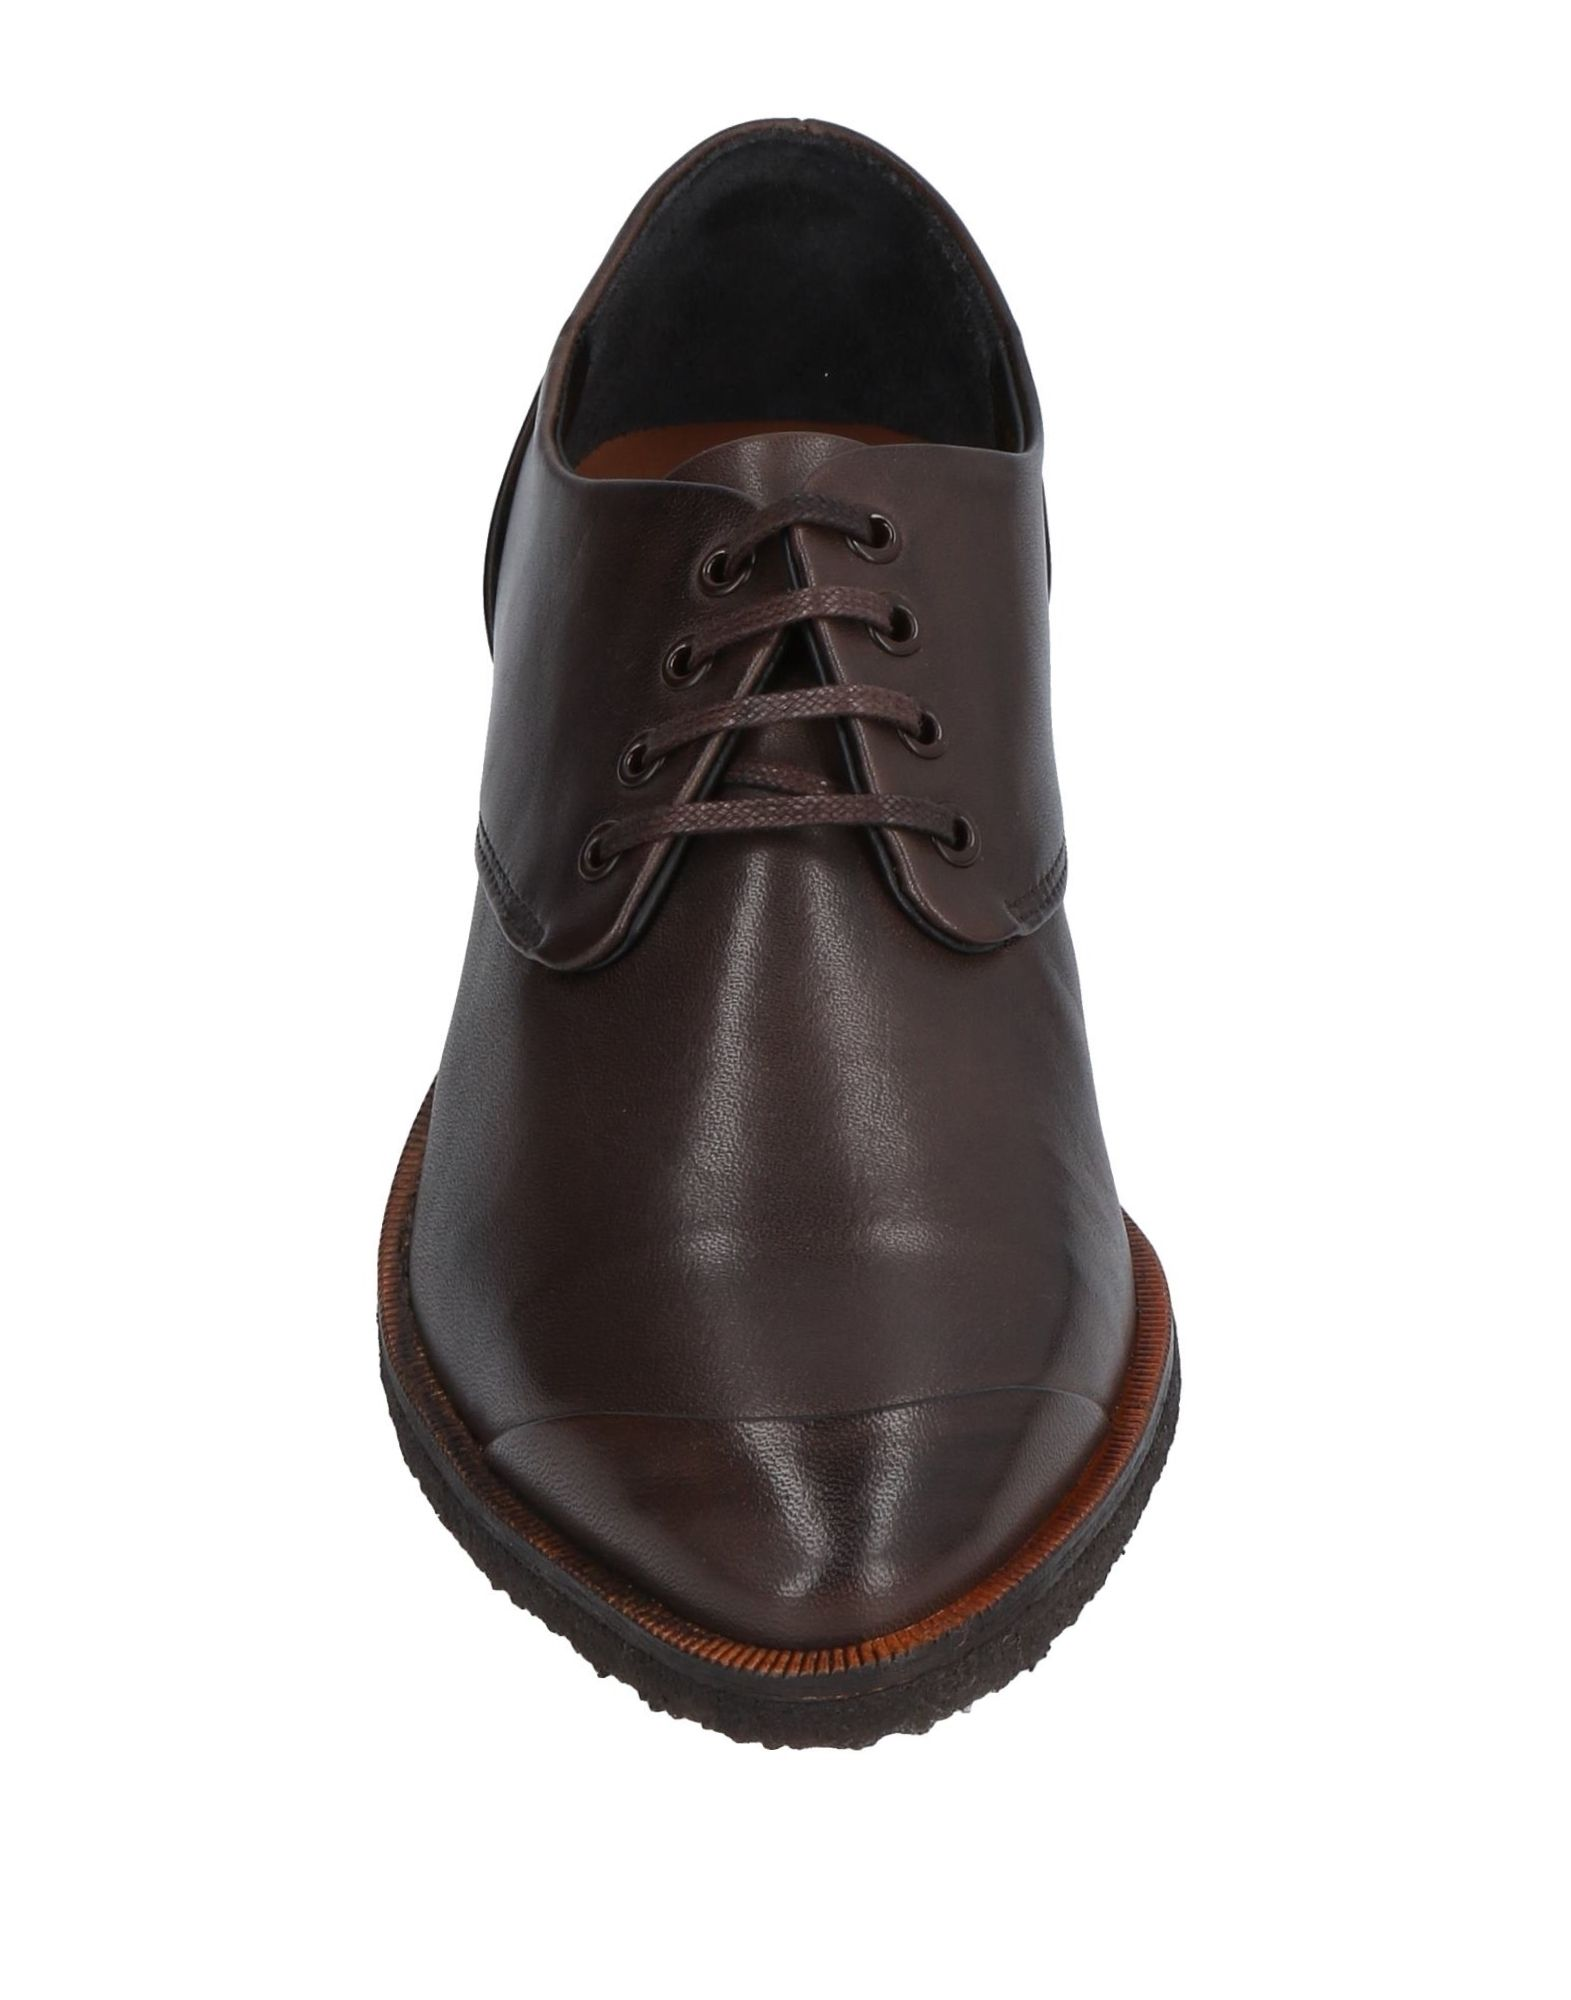 Stilvolle Schnürschuhe billige Schuhe Royal Republiq Schnürschuhe Stilvolle Damen  11460805CQ 98f9fb